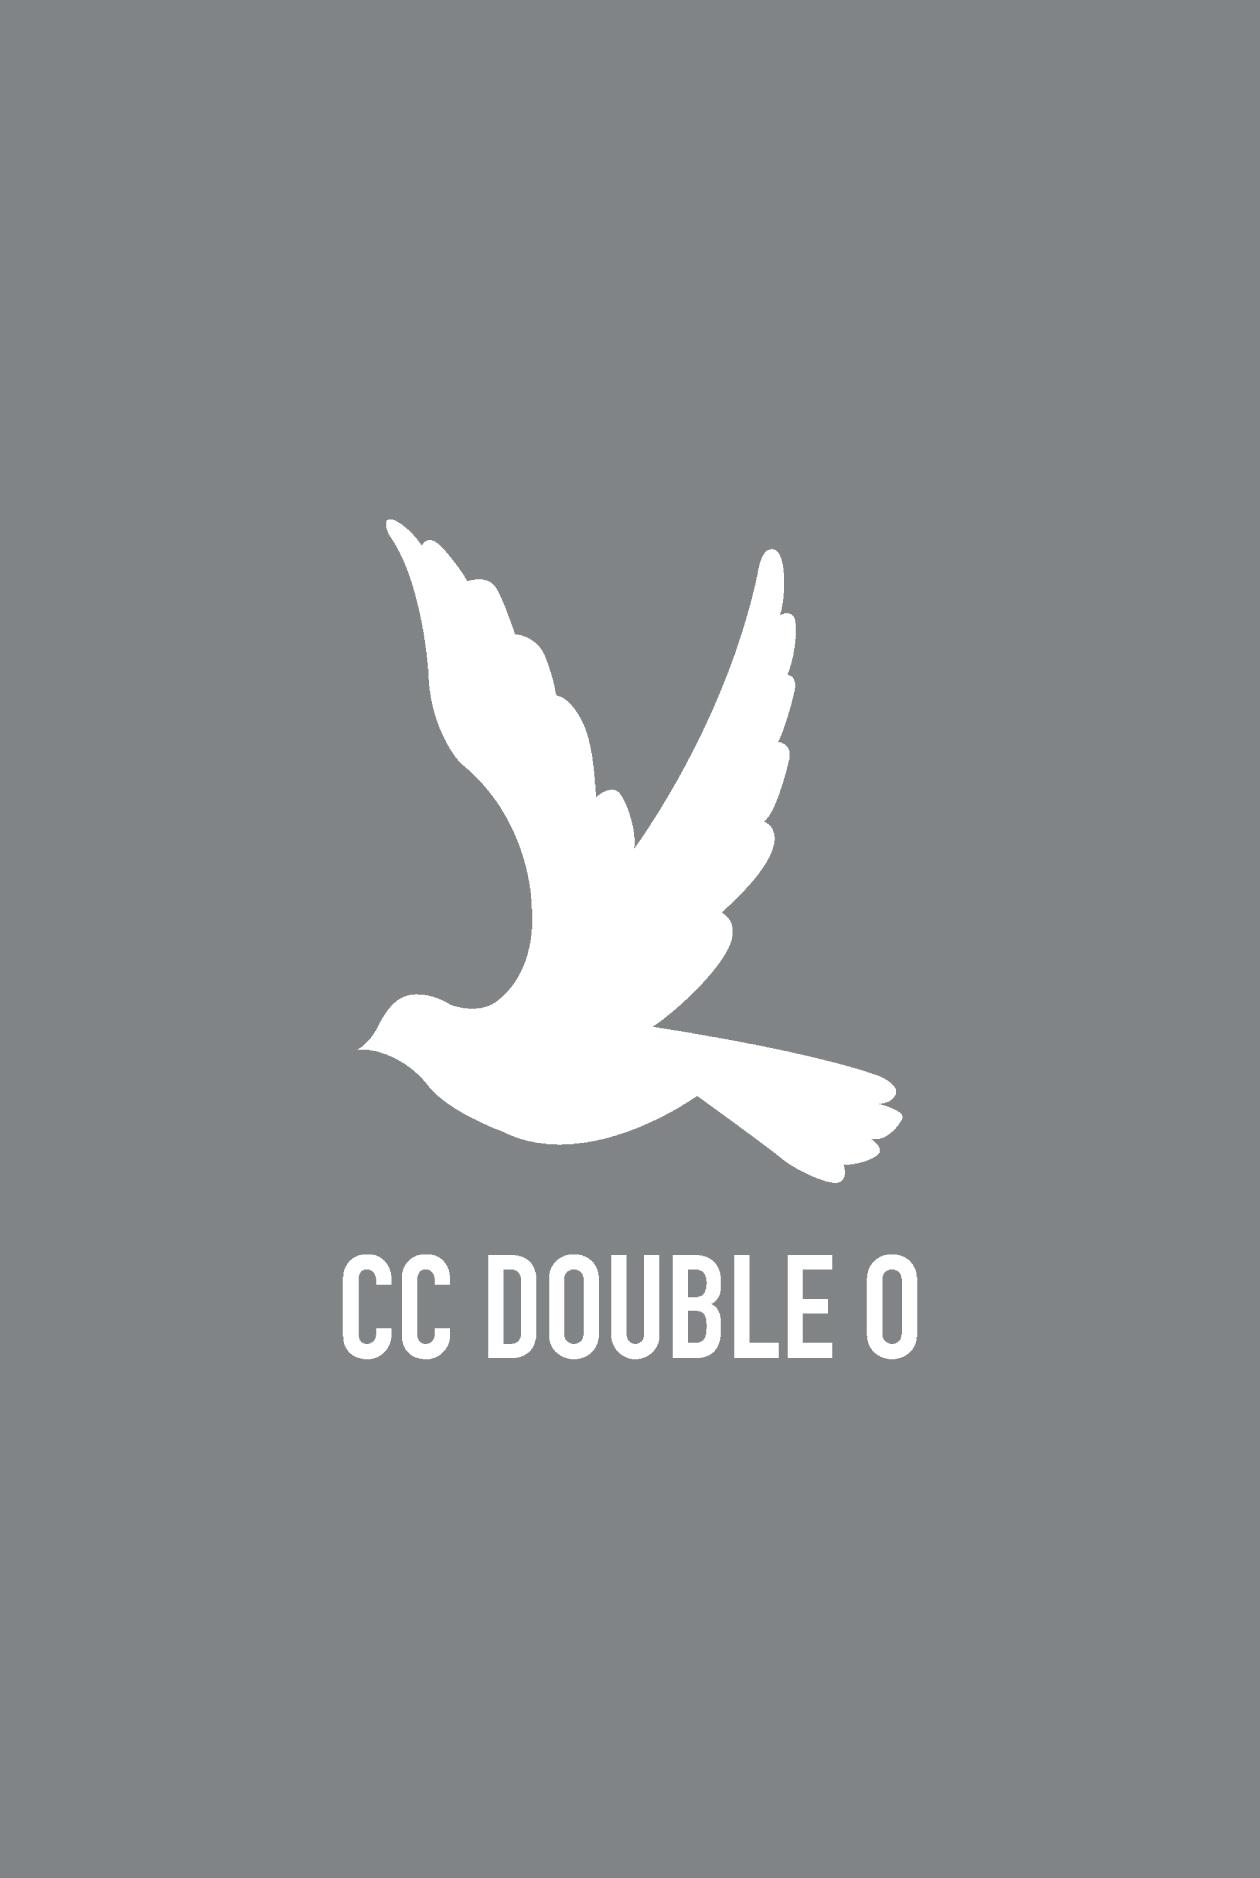 CC DOUBLE O Long-Sleeved Sport Tee